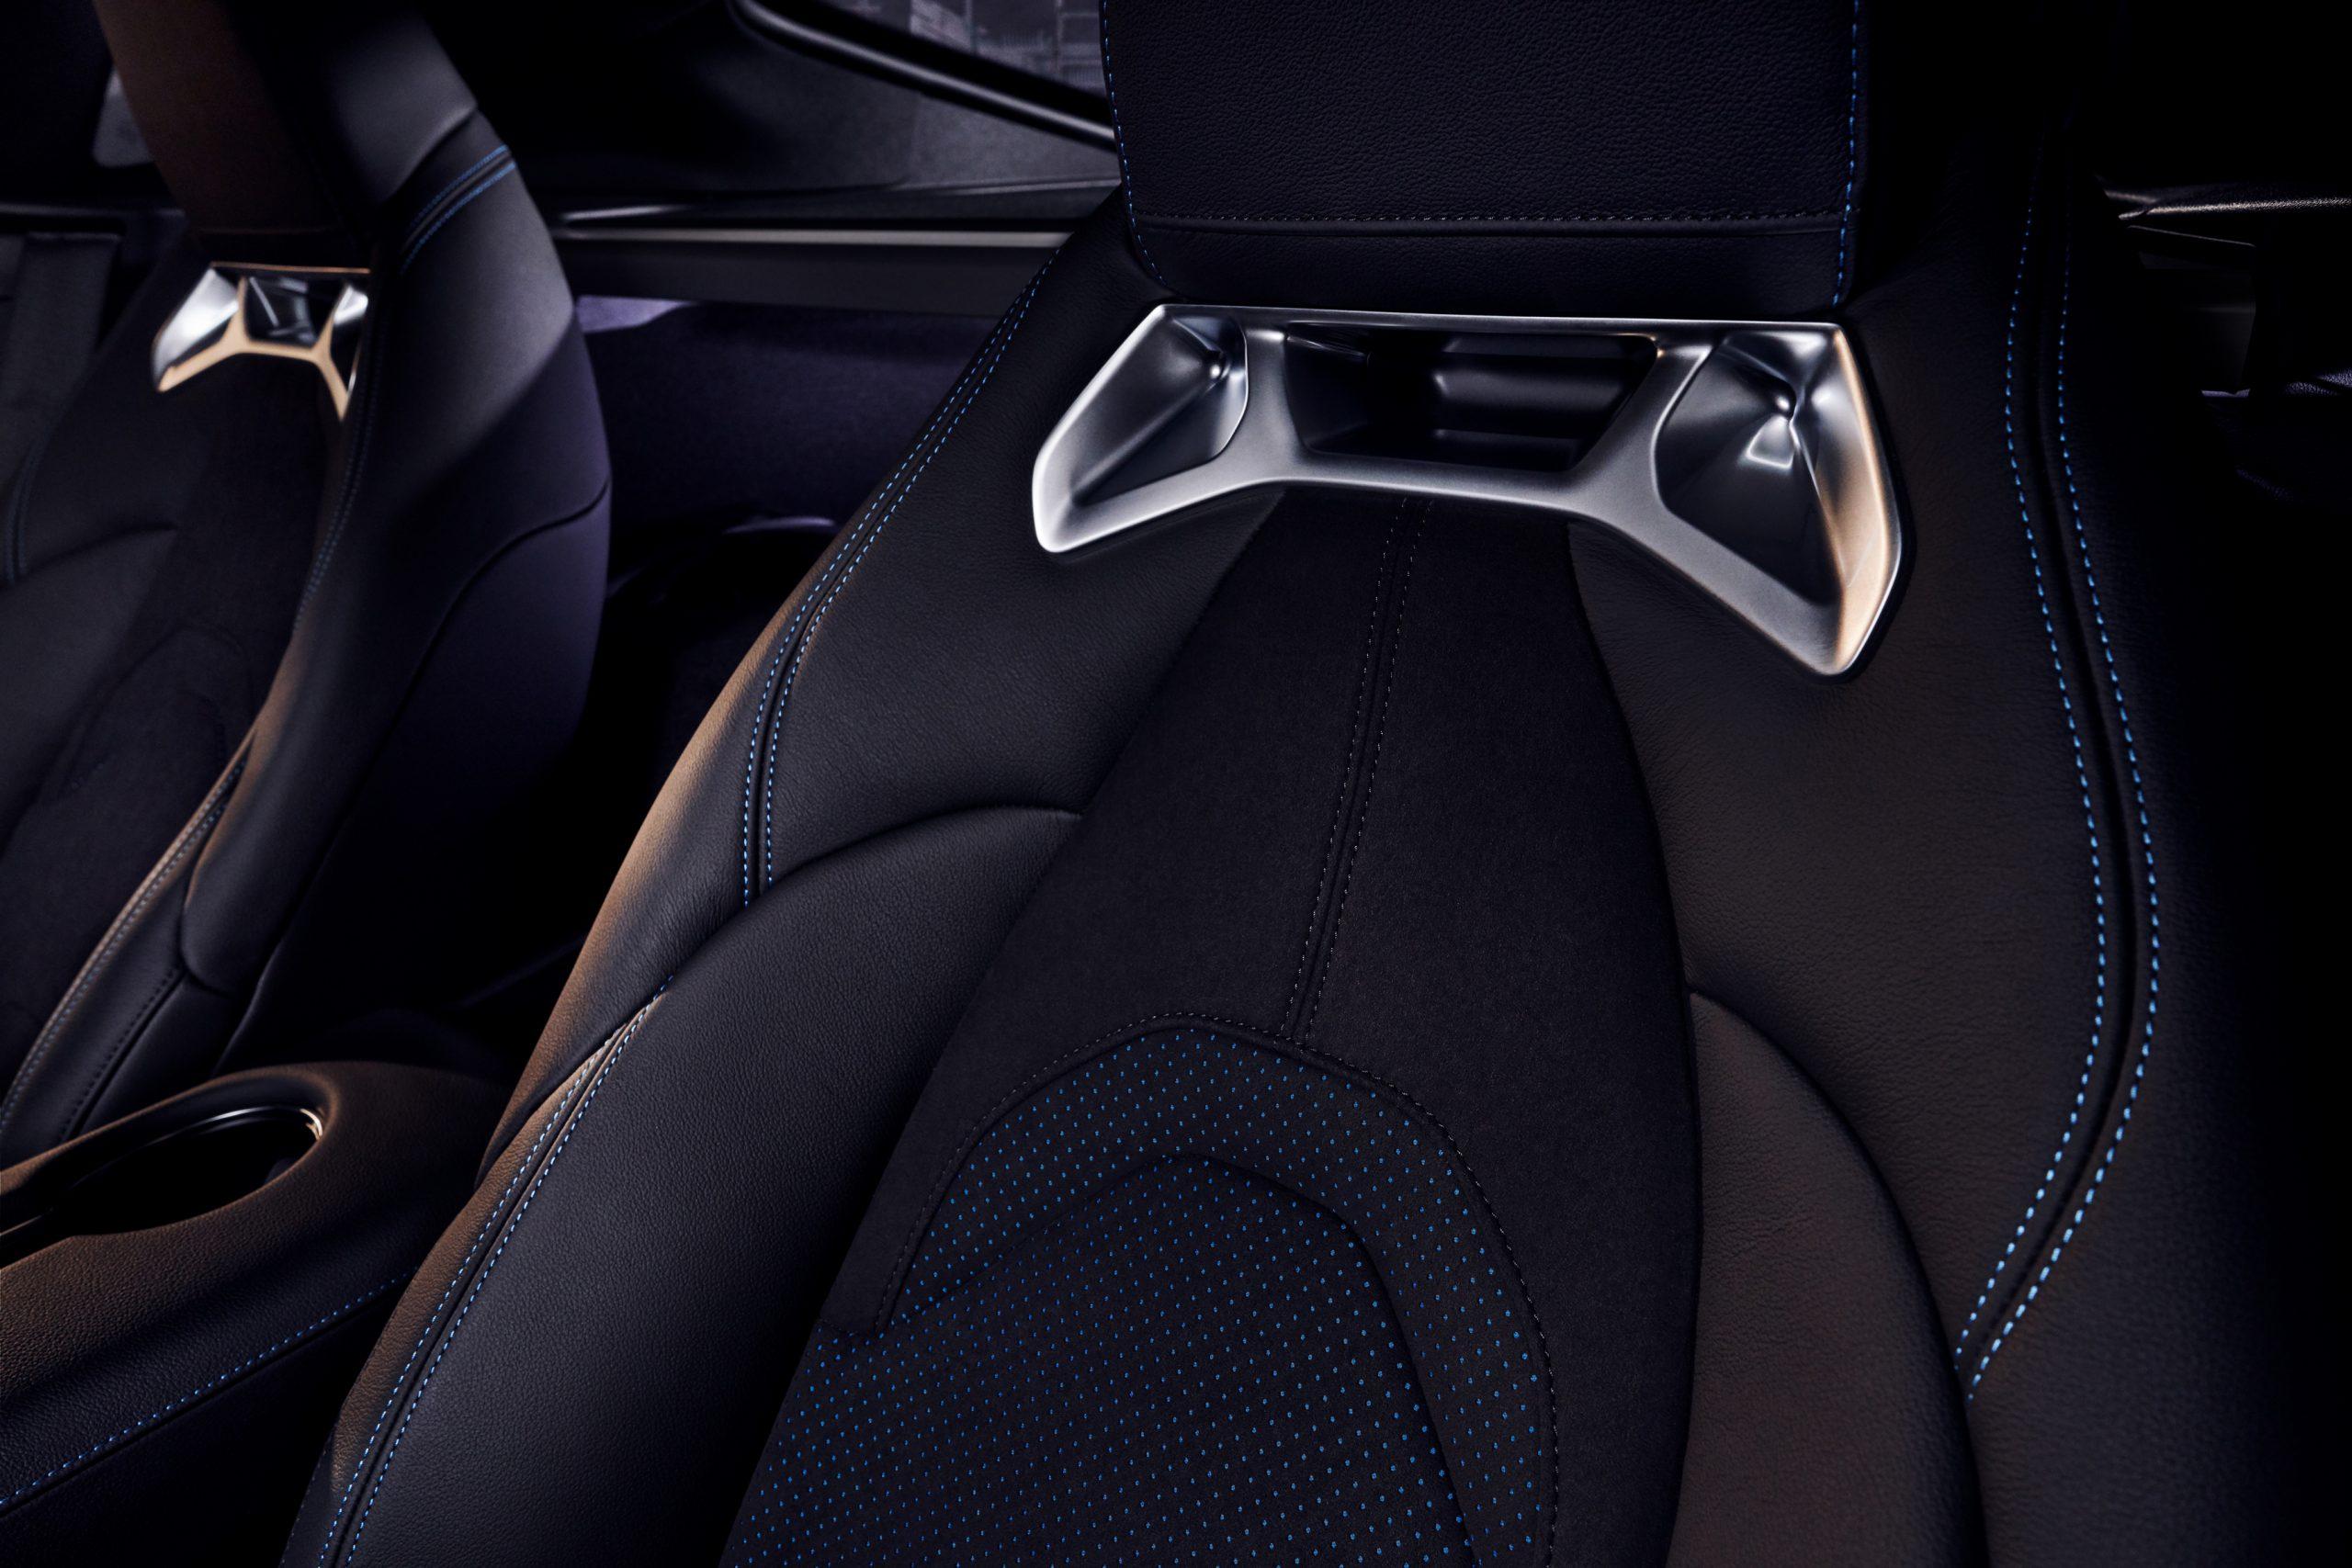 2021-GR-Supra-A91-Edition-Interior_001-scaled.jpg